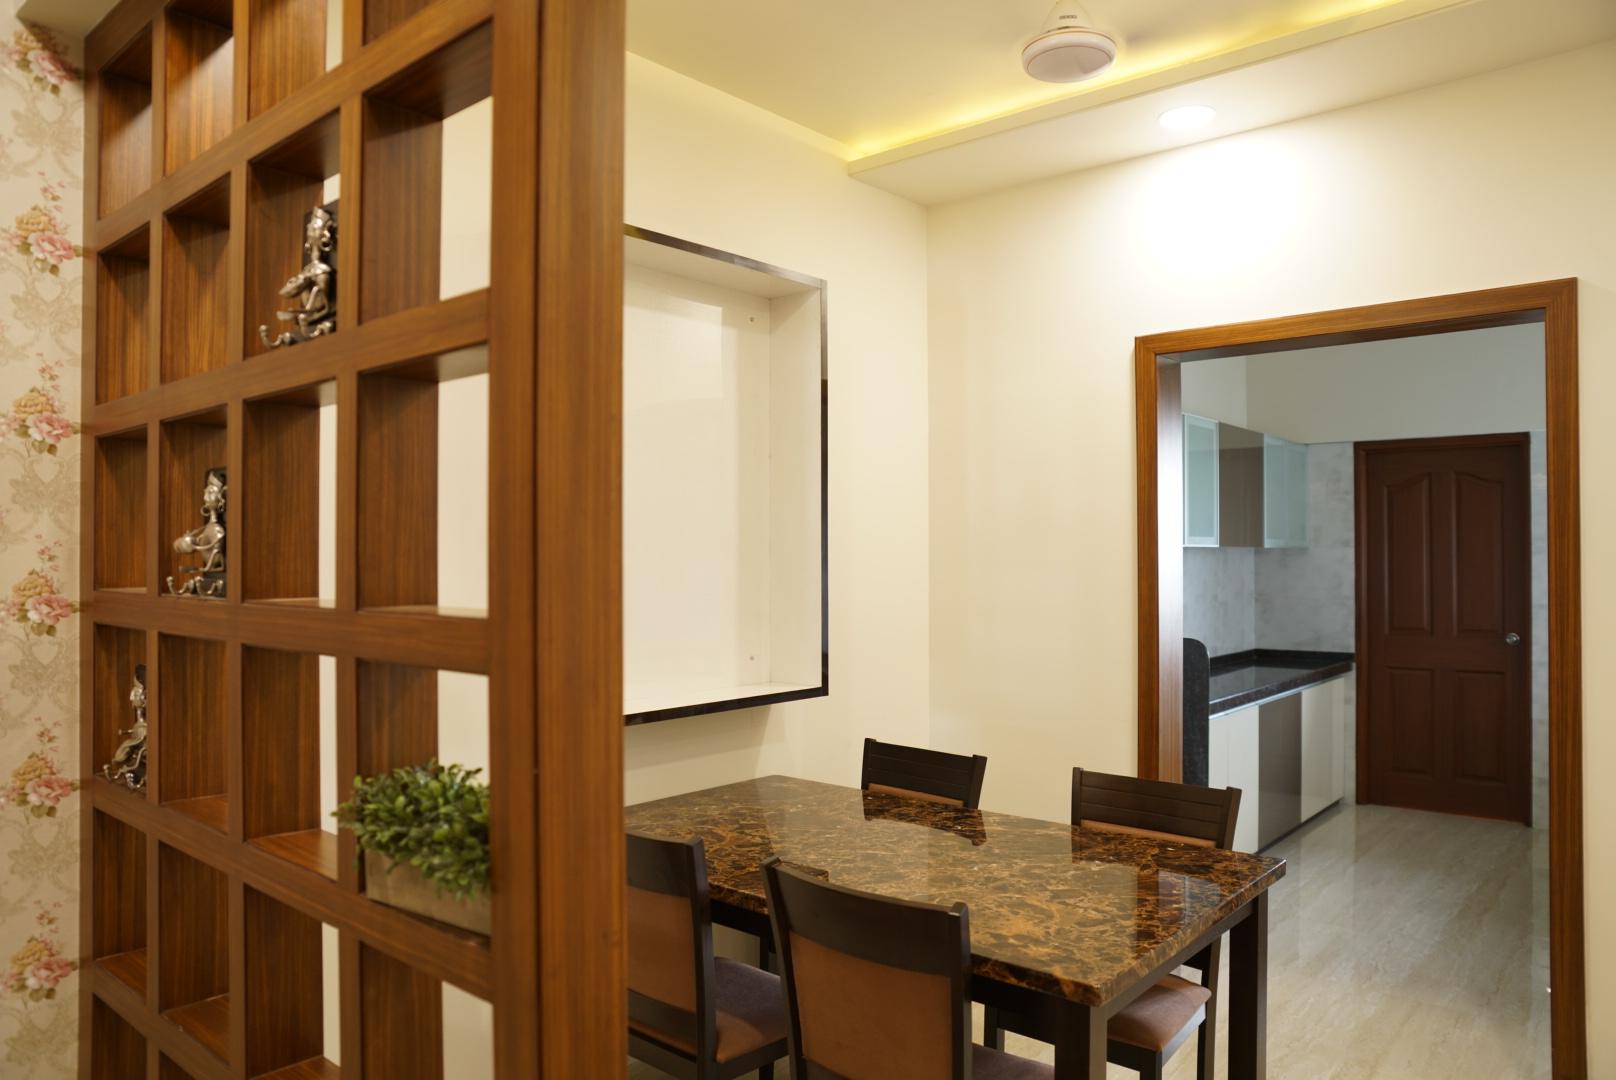 Best real estate developerGolch